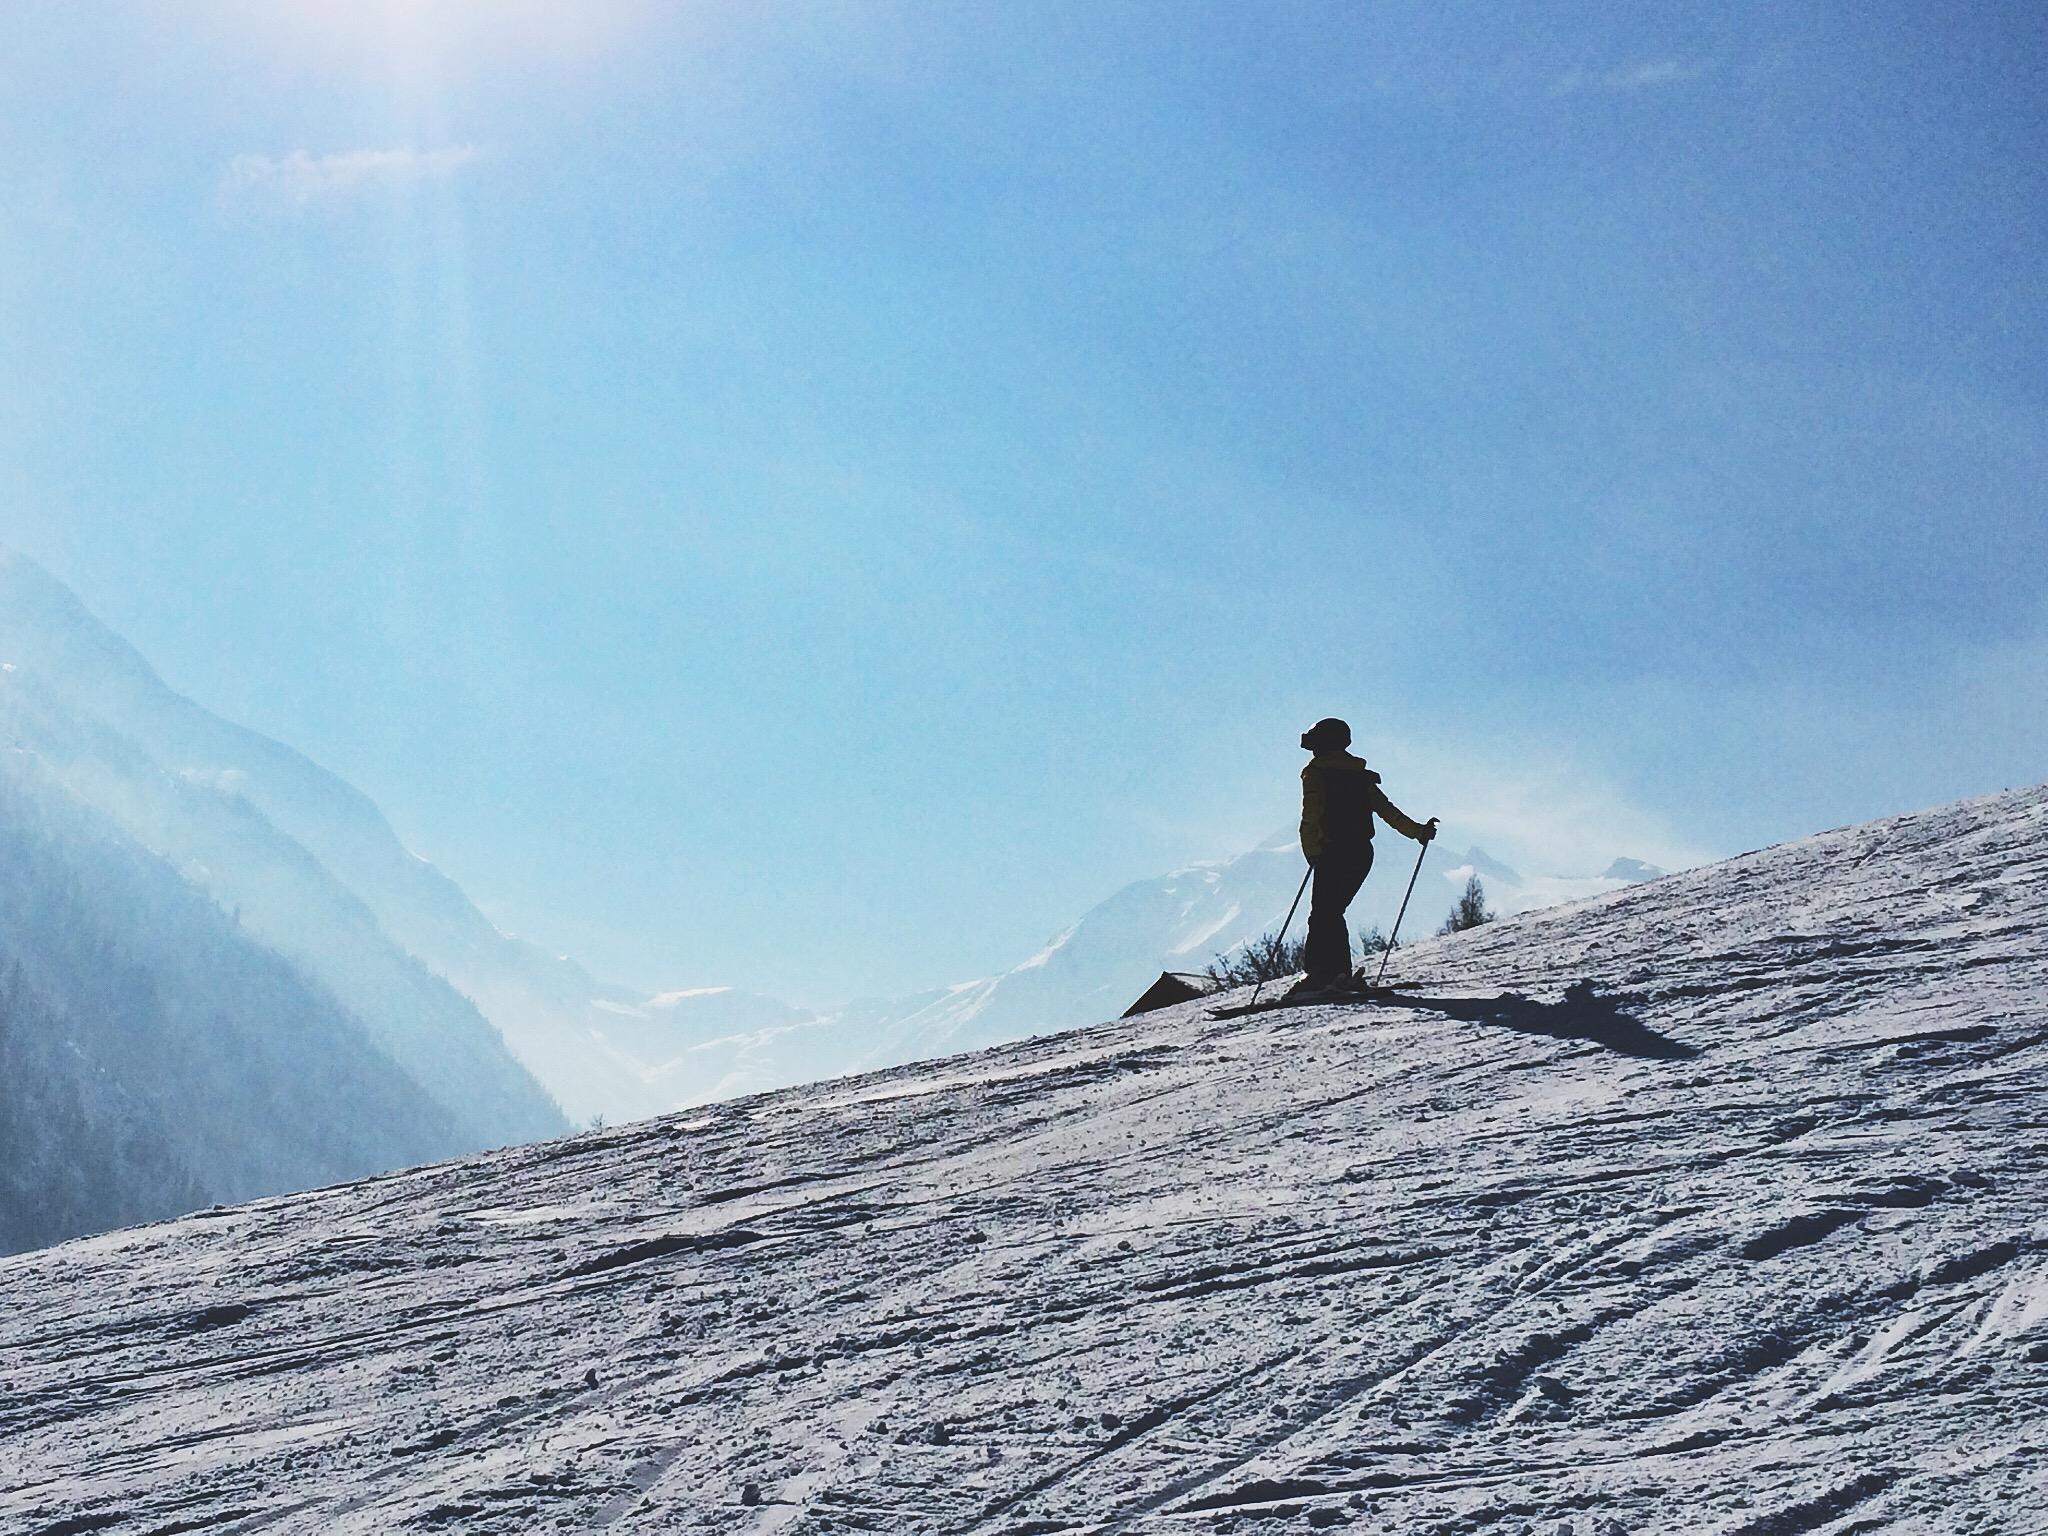 Austrian Alps in background, Marina skiing